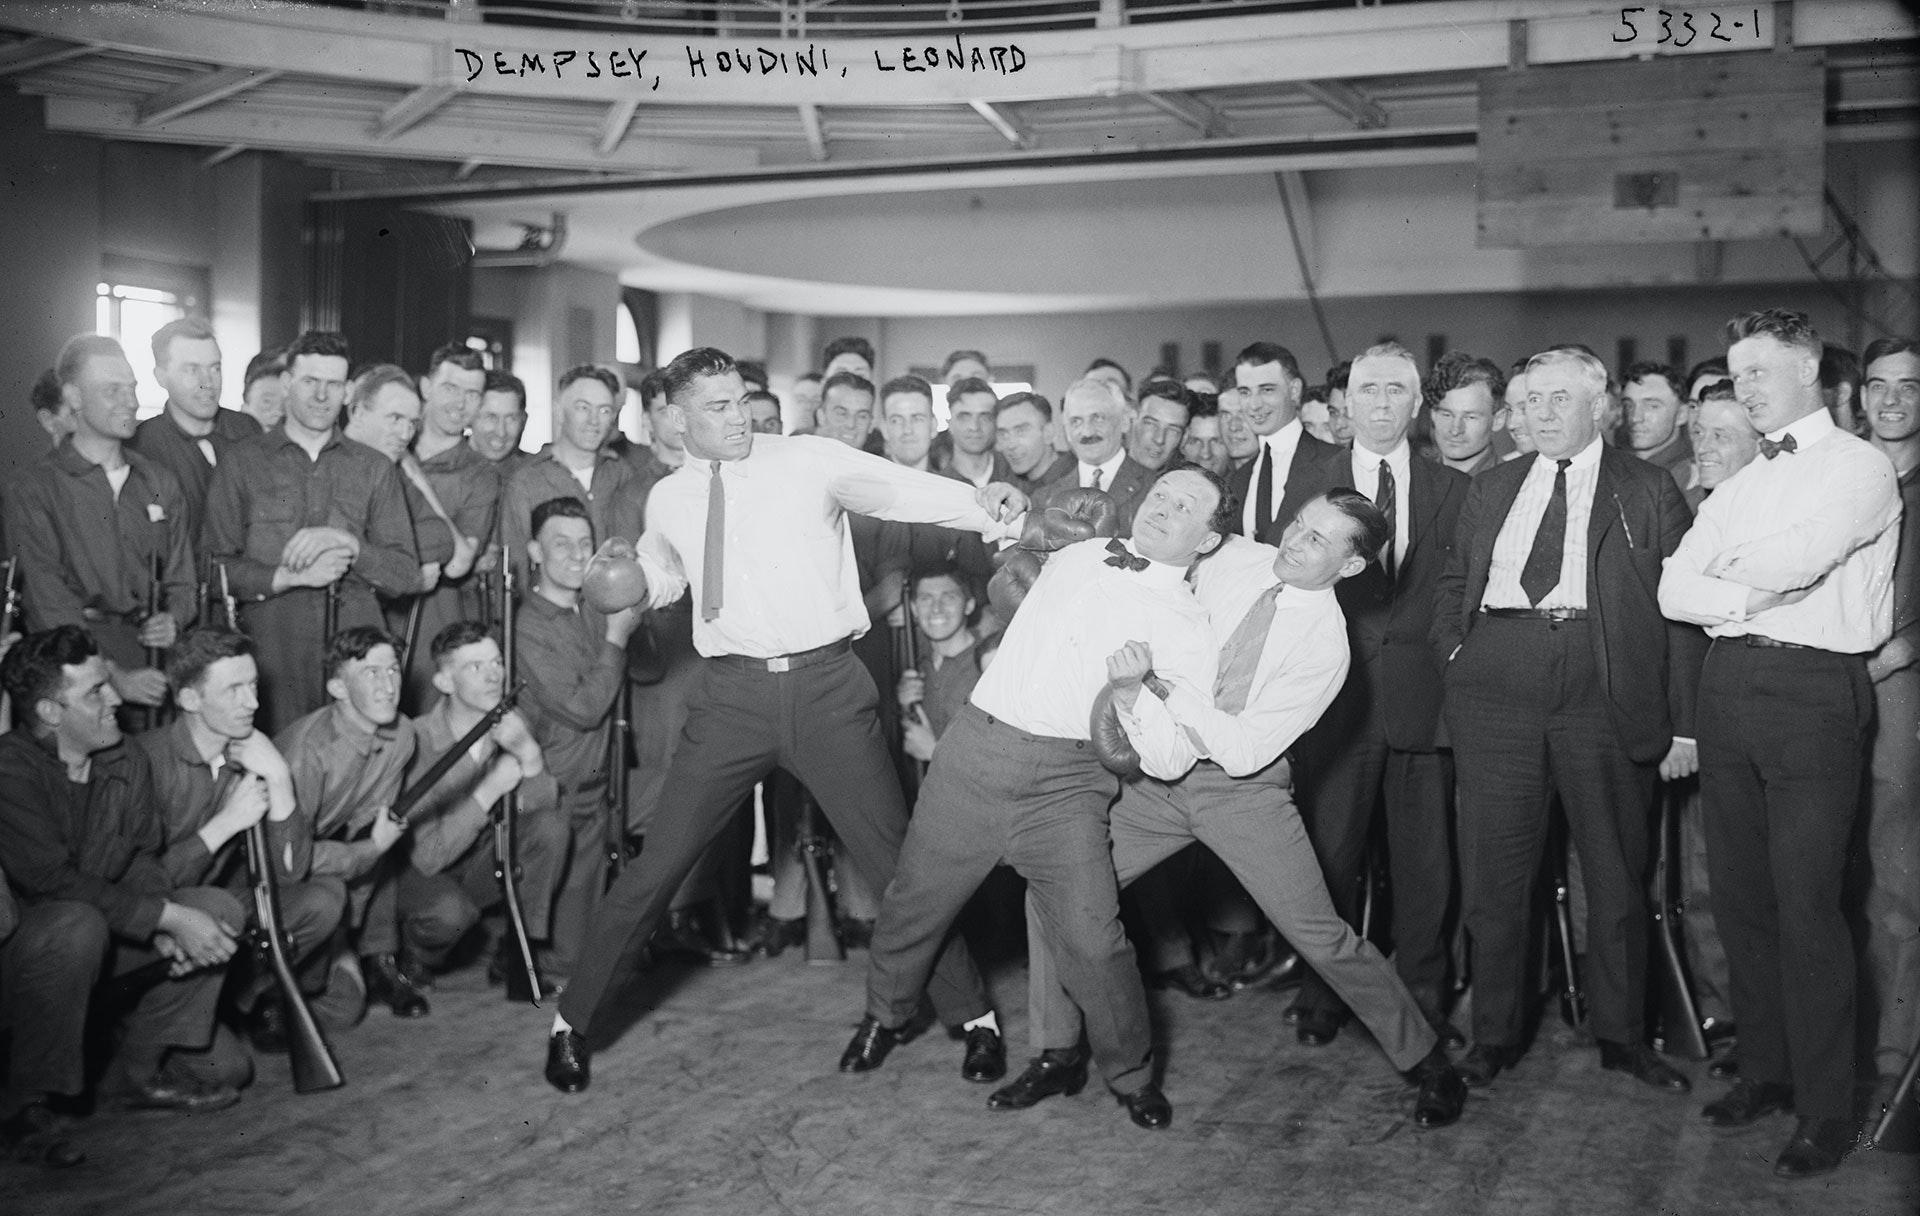 Dempsey, Houdini, Leonard (boxing)